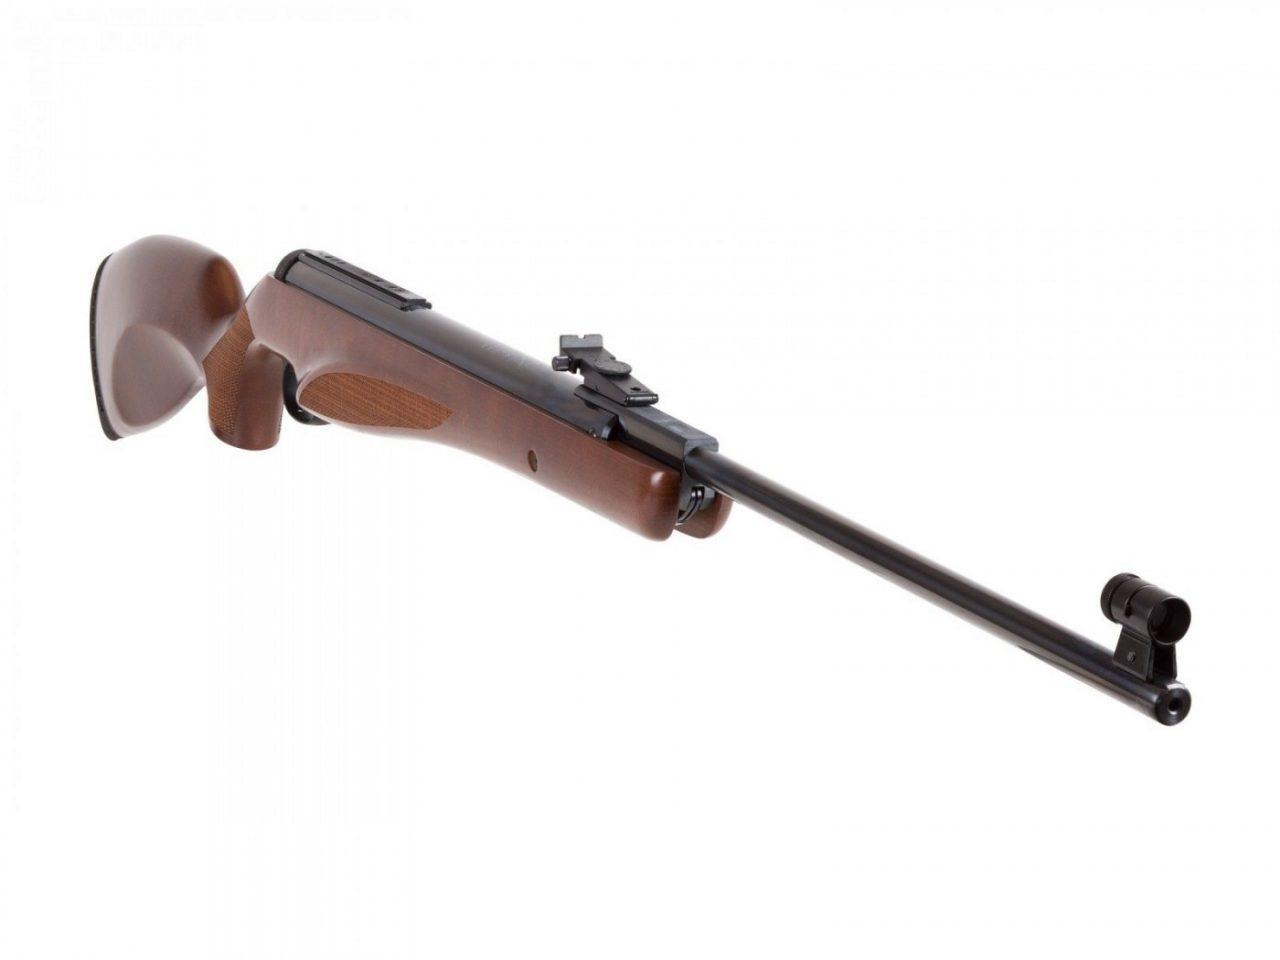 Обзор пневматической винтовки Диана 350 Магнум